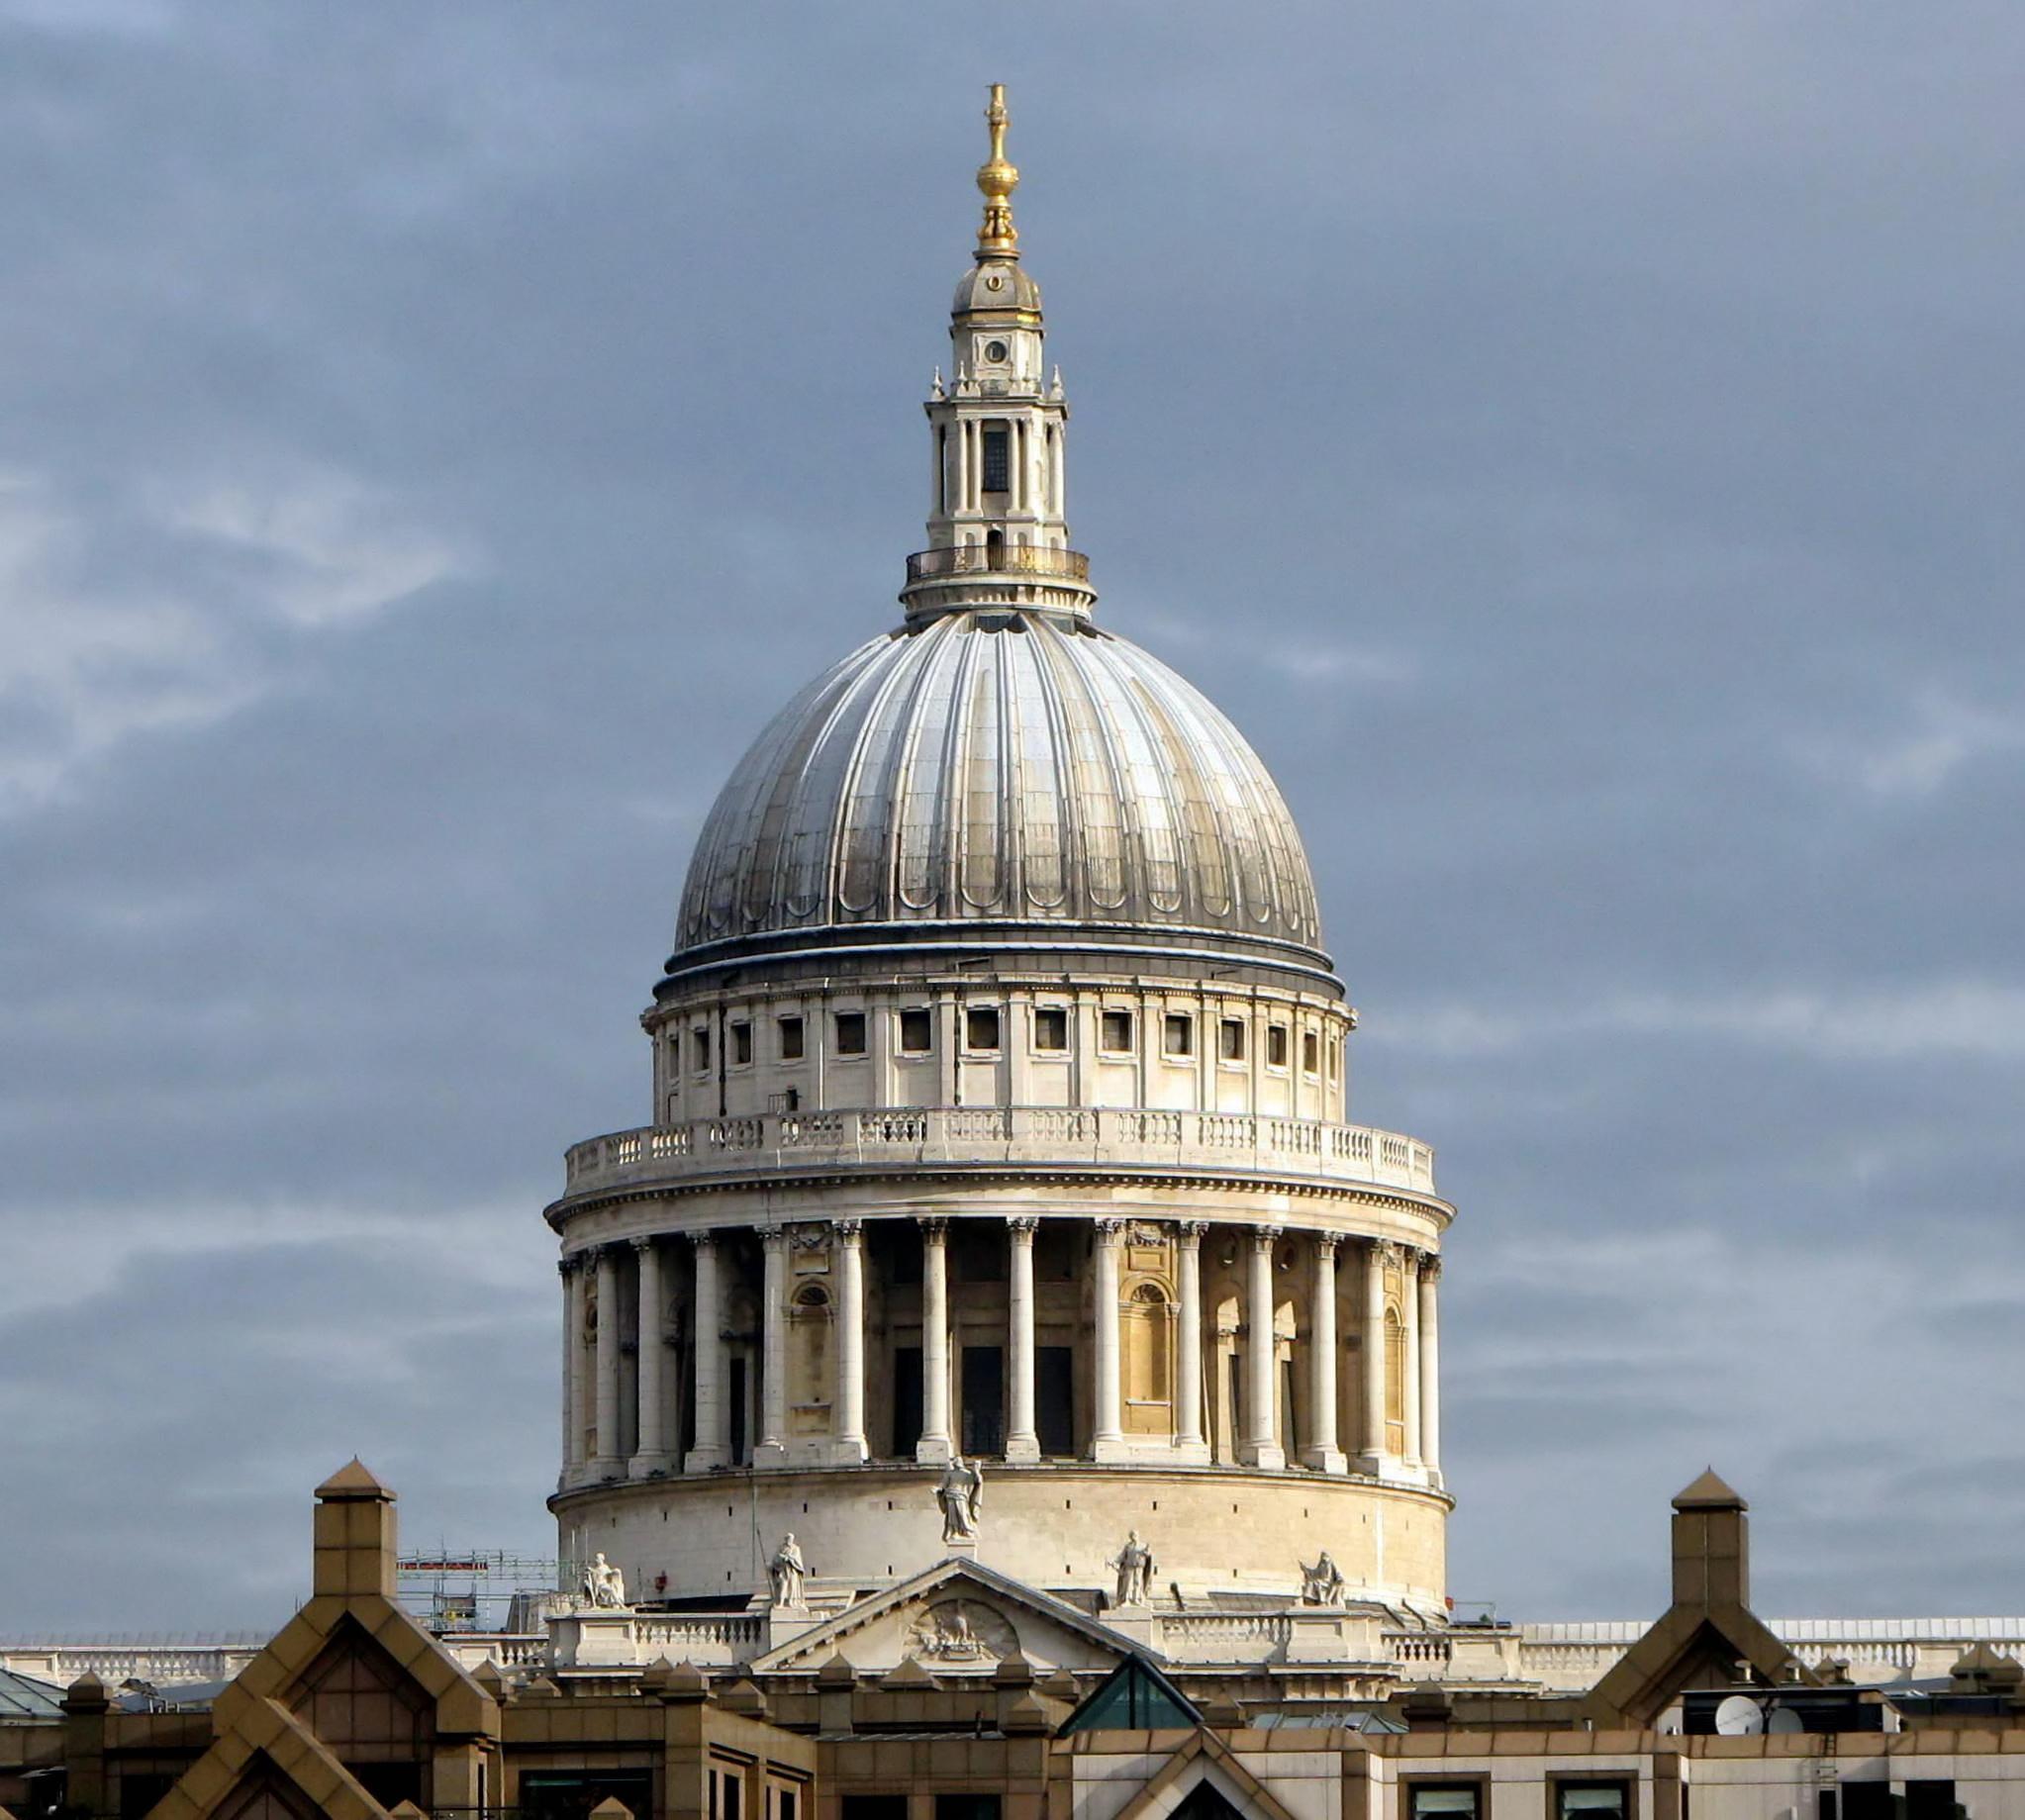 Resultado de imagem para London's domed St. Paul's Cathedral